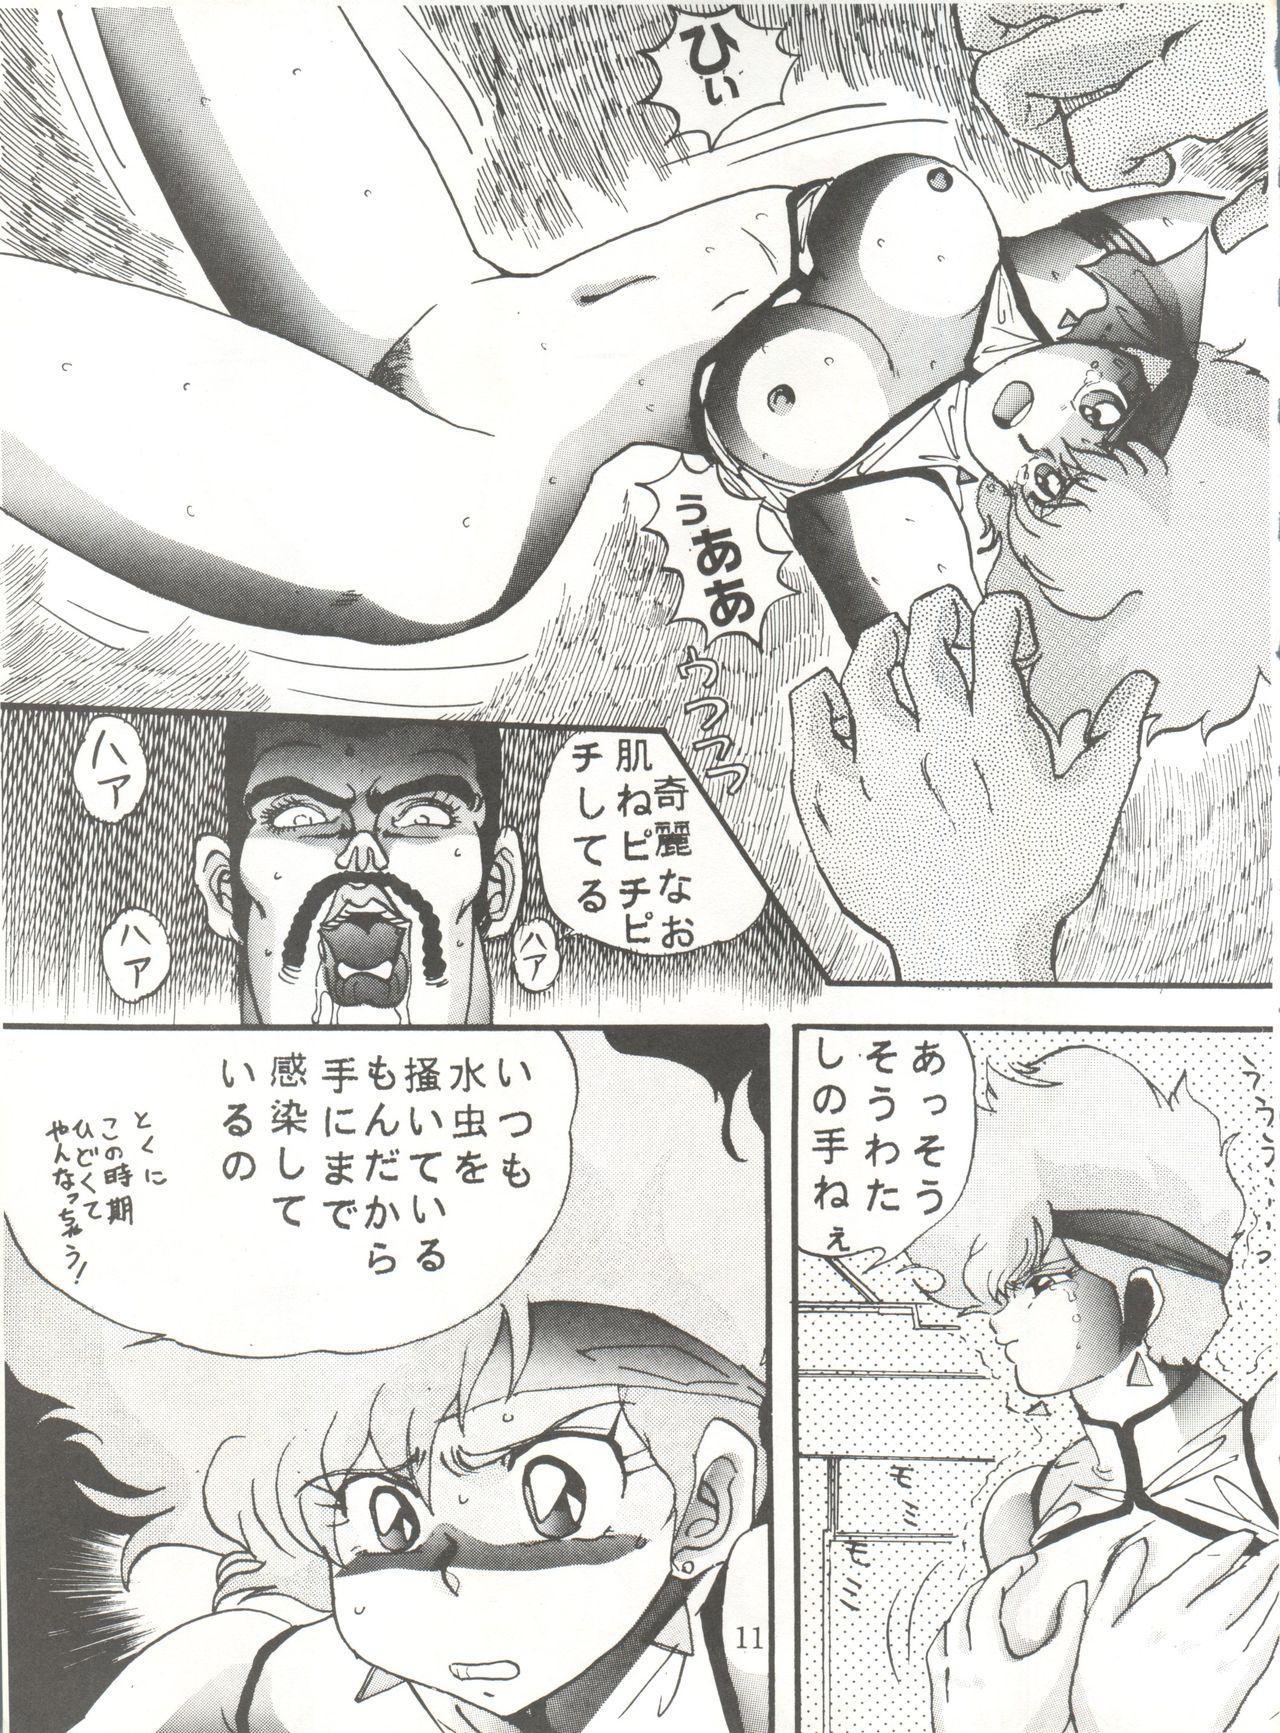 [Global One (MARO)] Sadistic 5 (Cutey Honey, Devilman, Sailor Moon), [Global One (MARO)] Sadistic (Dirty Pair, Fushigi no Umi no Nadia, Sailor Moon), [Studio Ikkatsumajin] .ribbon (Hime-chan's Ribbon) 70